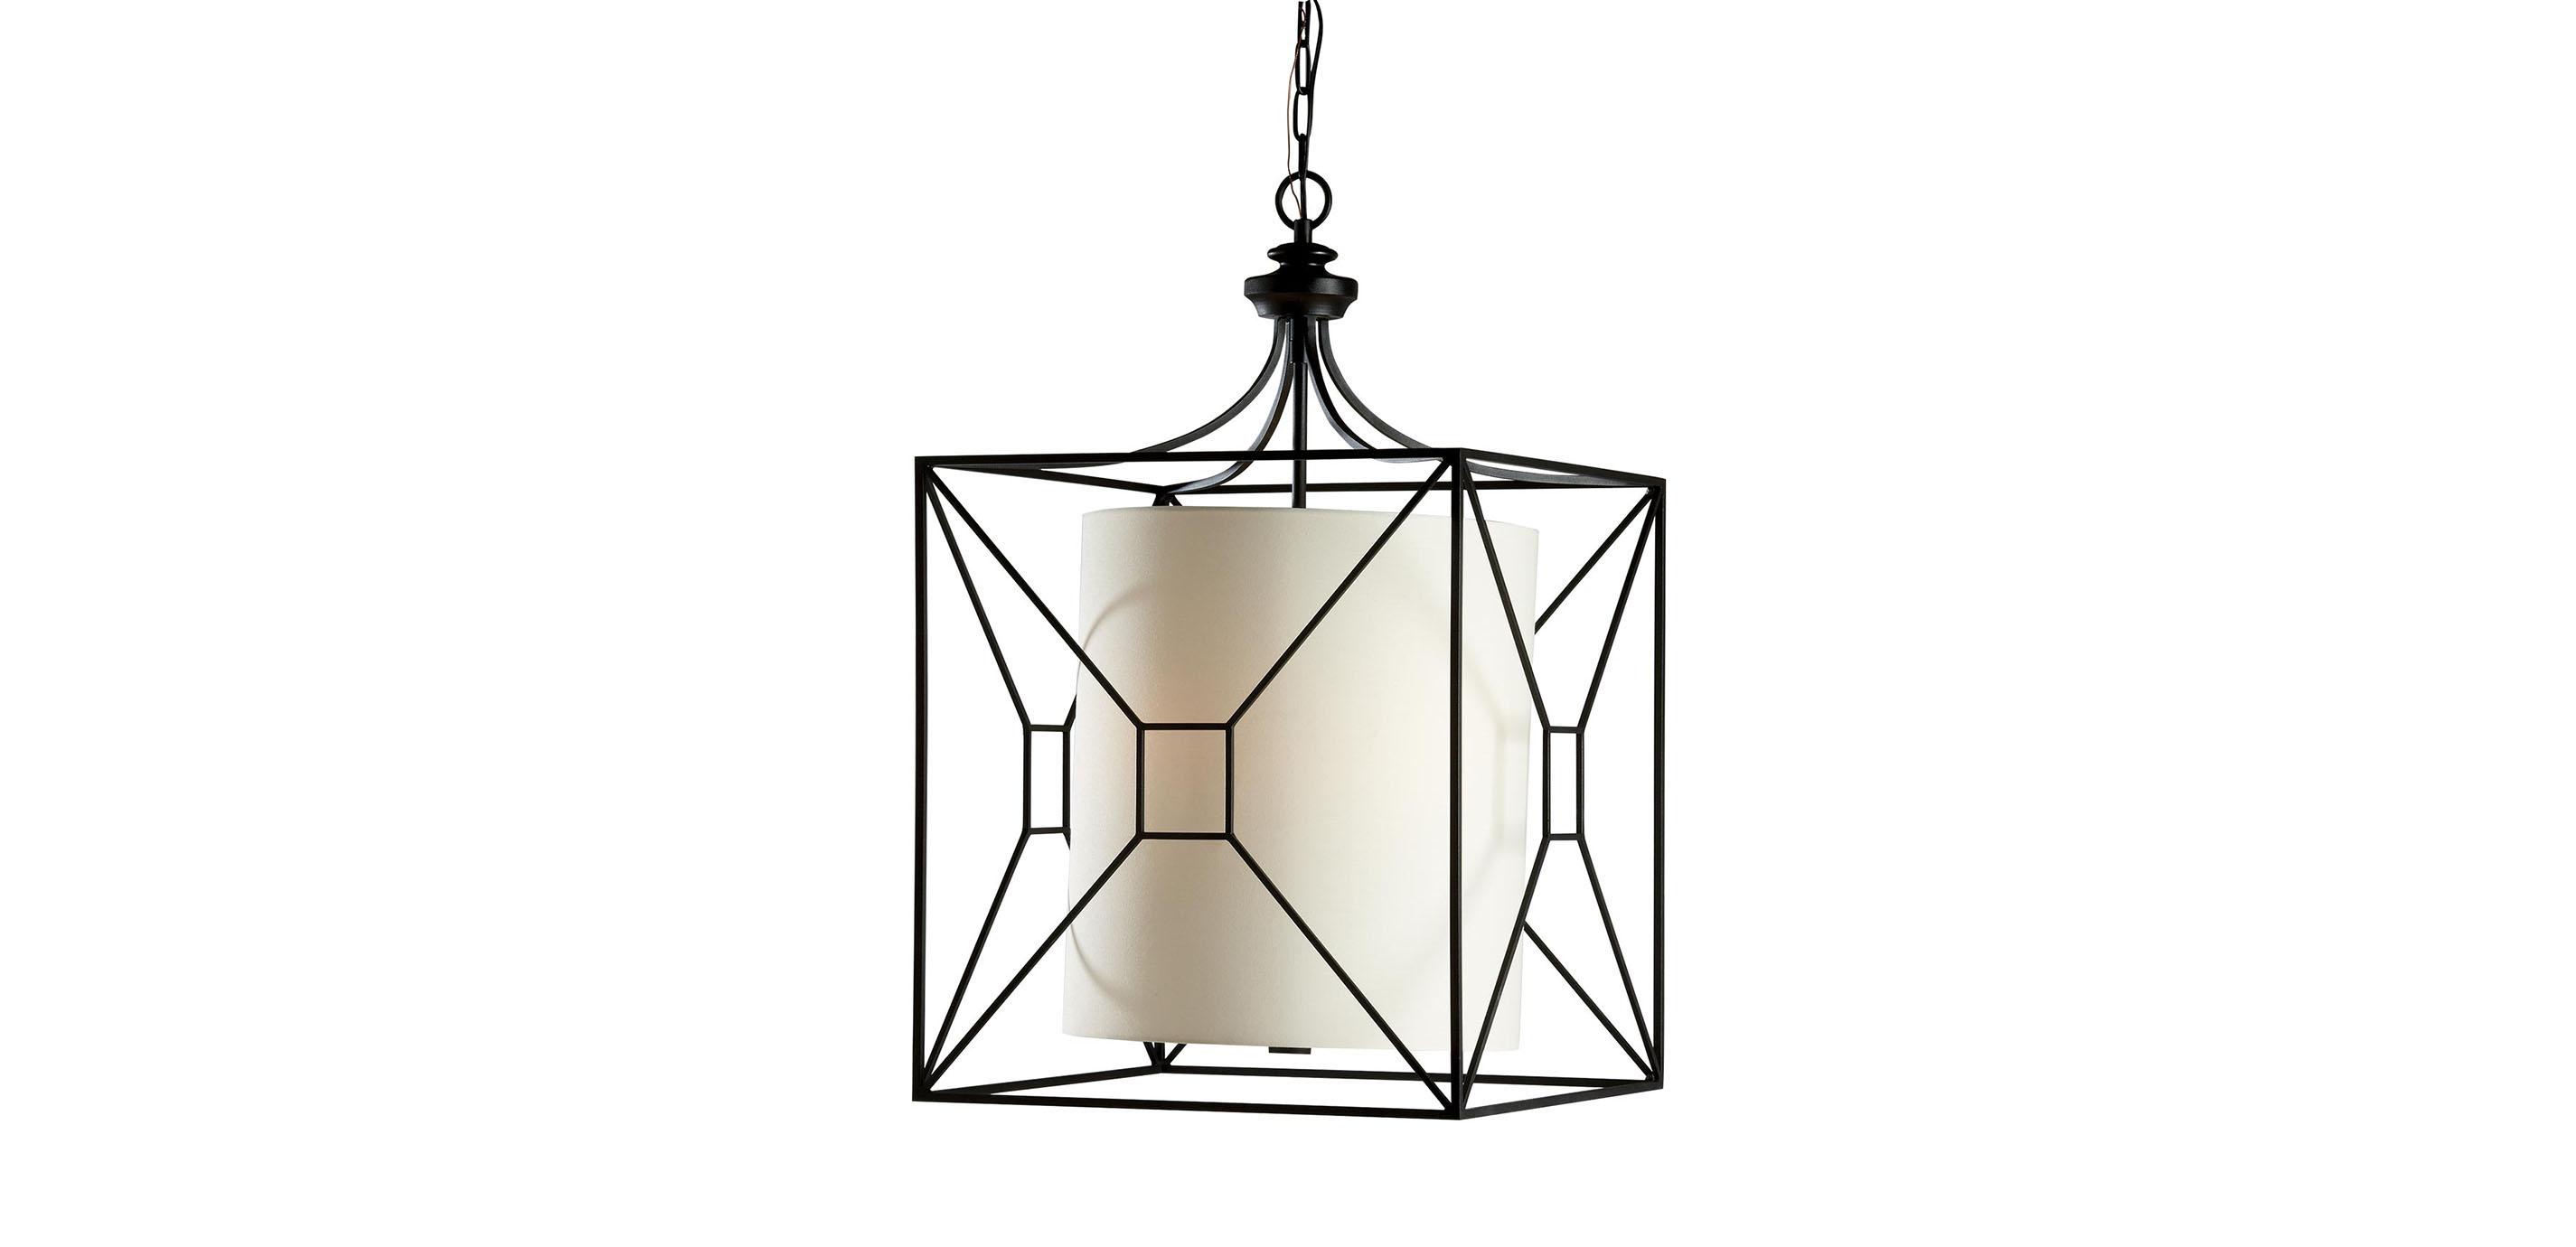 Tivoli Cage Lantern Chandeliers